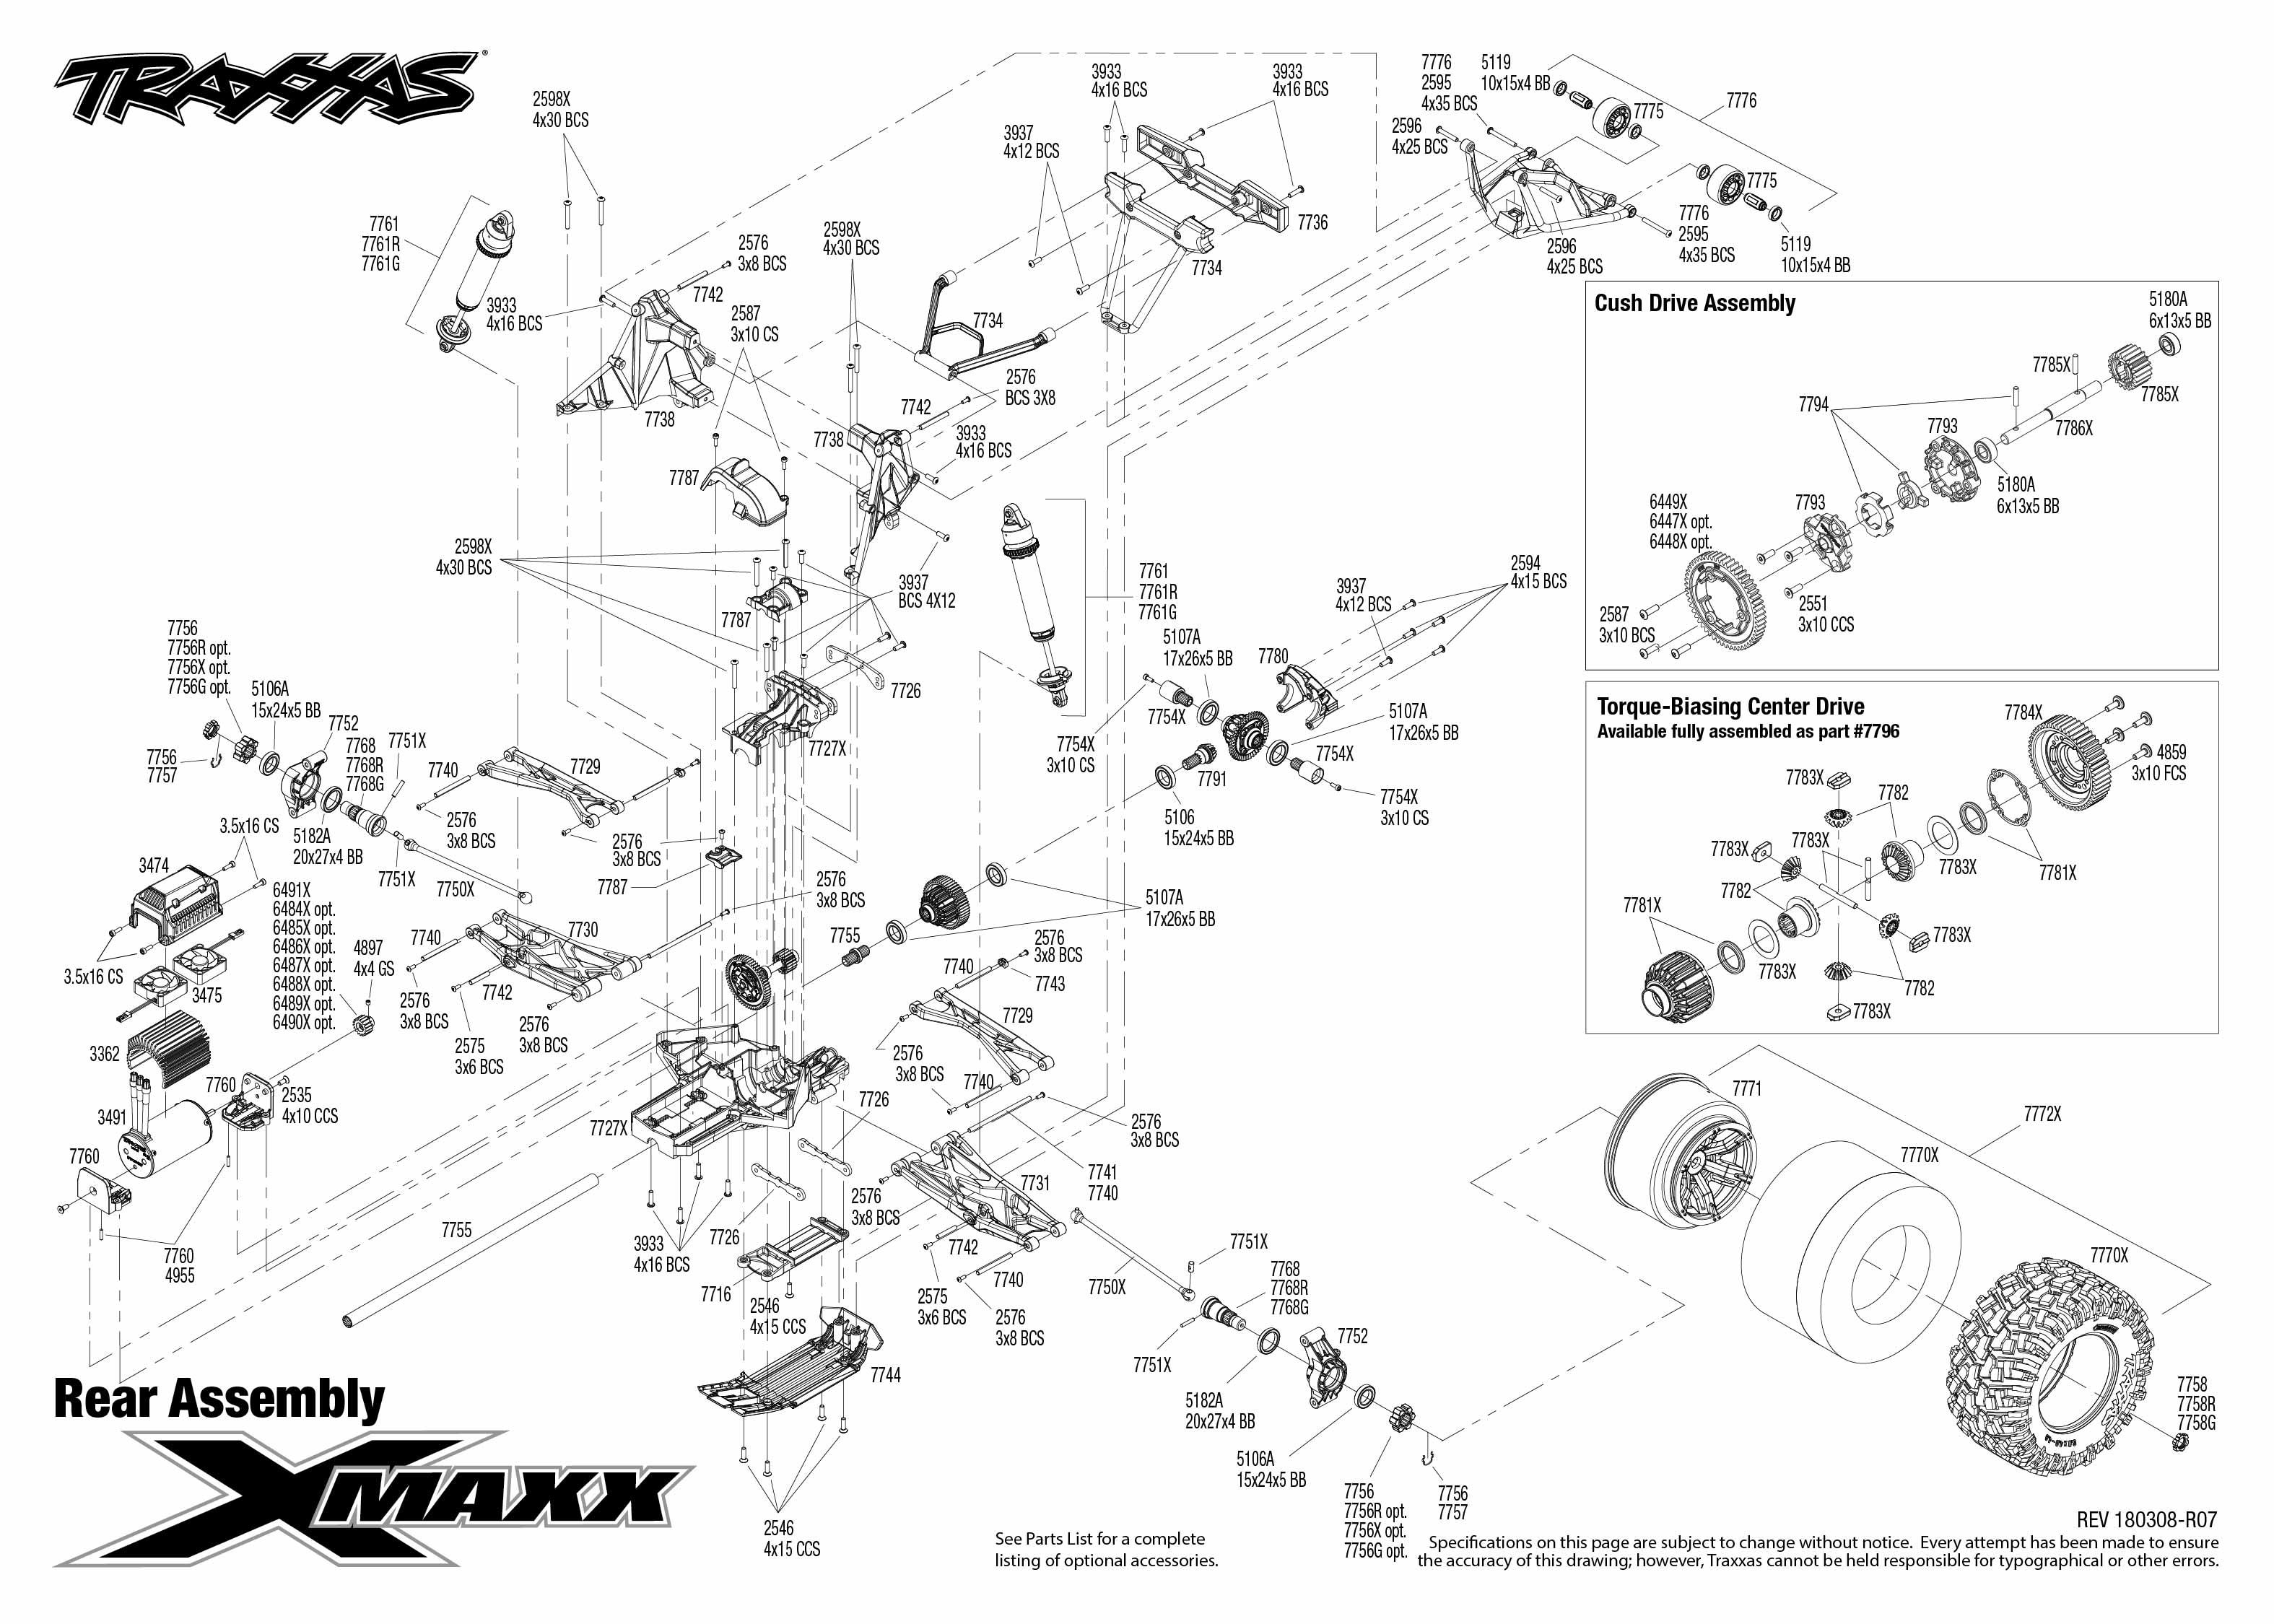 Traxxas X-Maxx | EuroRC com